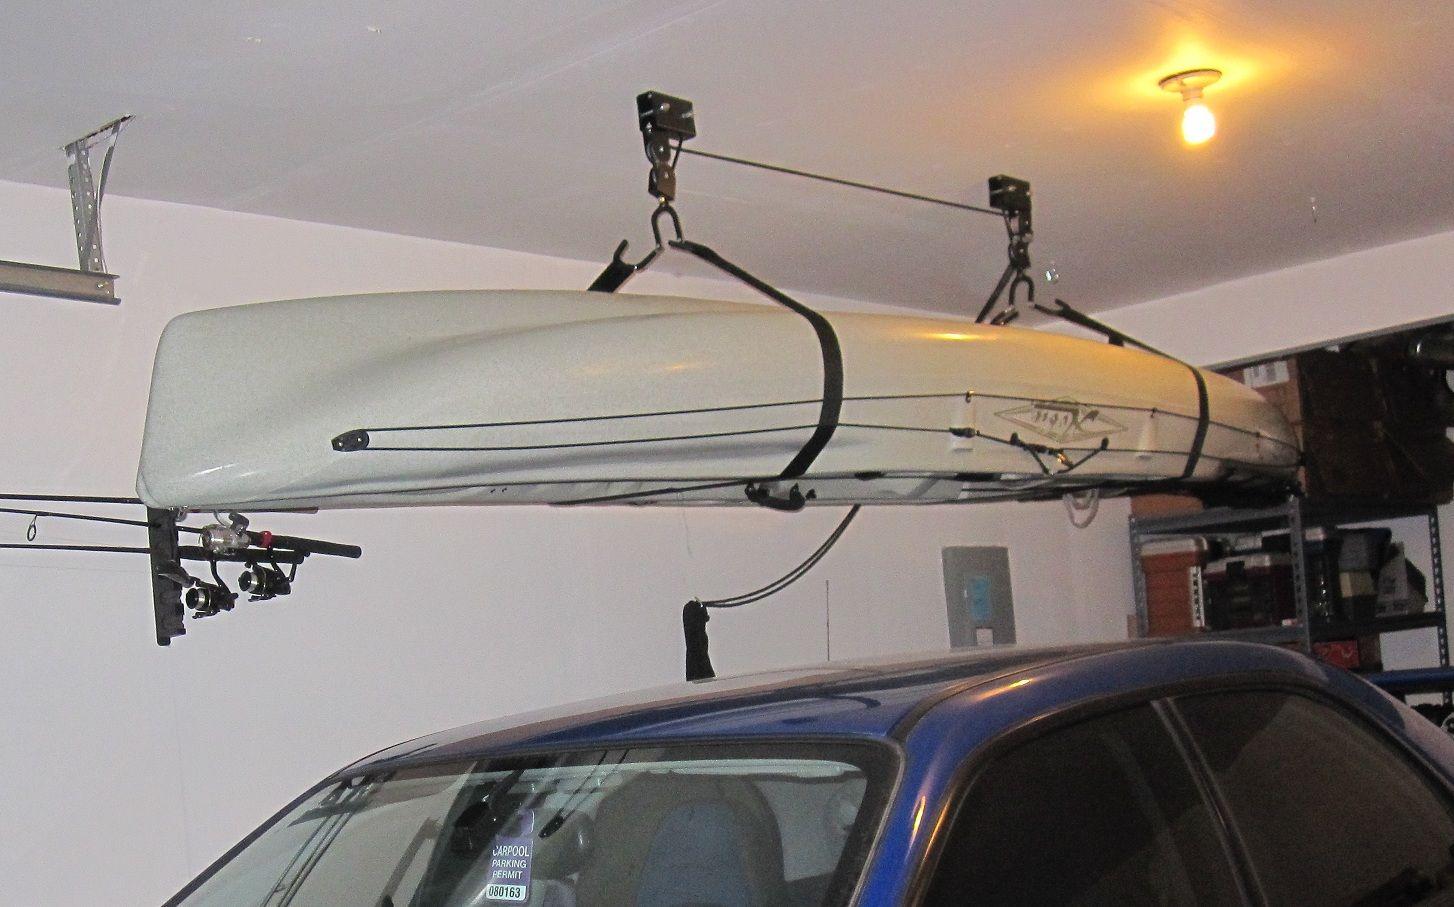 design fahrrad wandhalterung kayak elegant garage dock ideas for selection bike storage